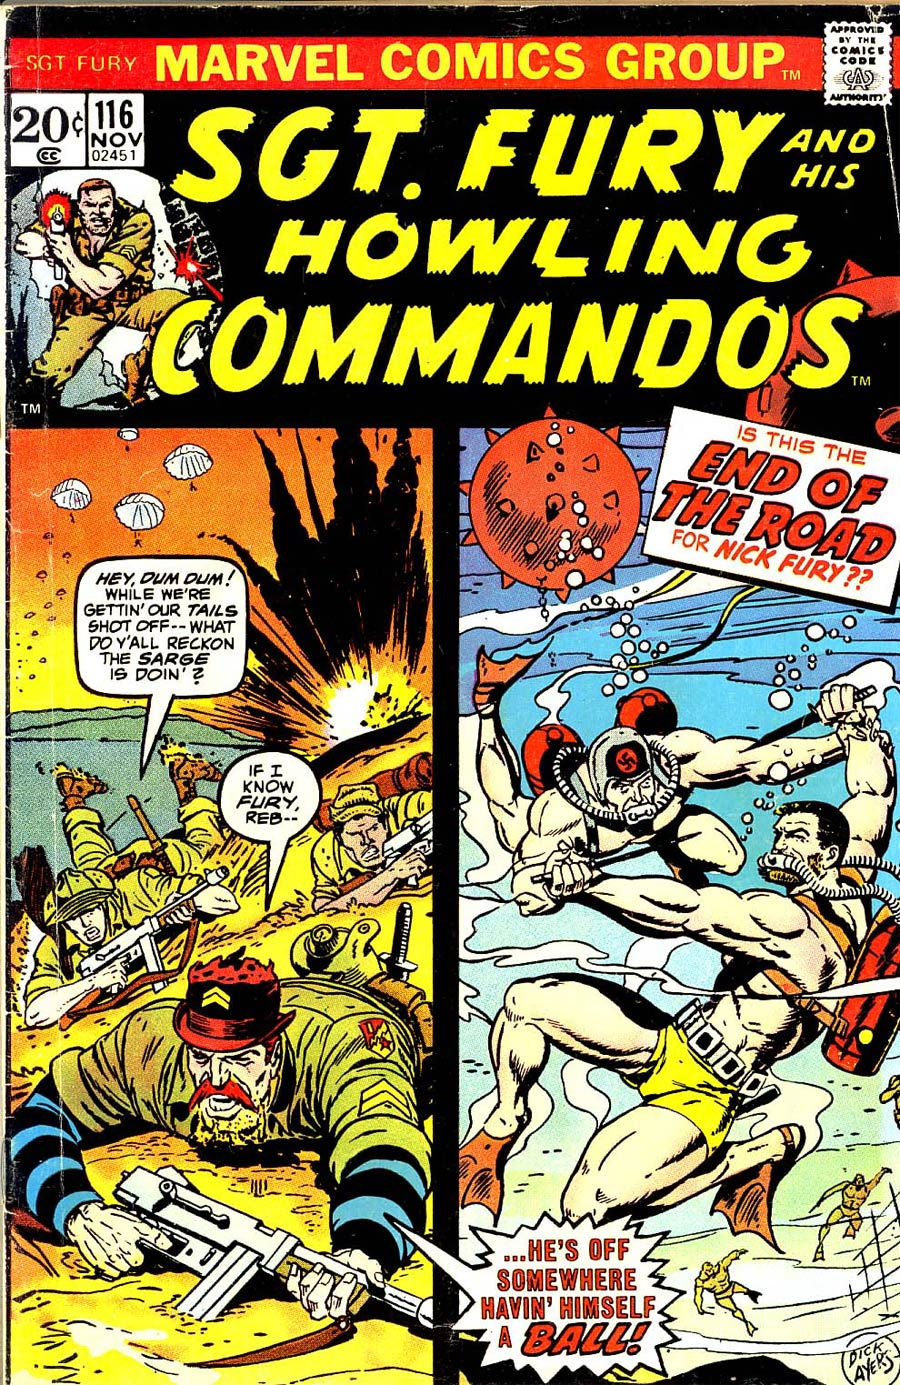 Sgt. Fury & His Howling Commandos #116